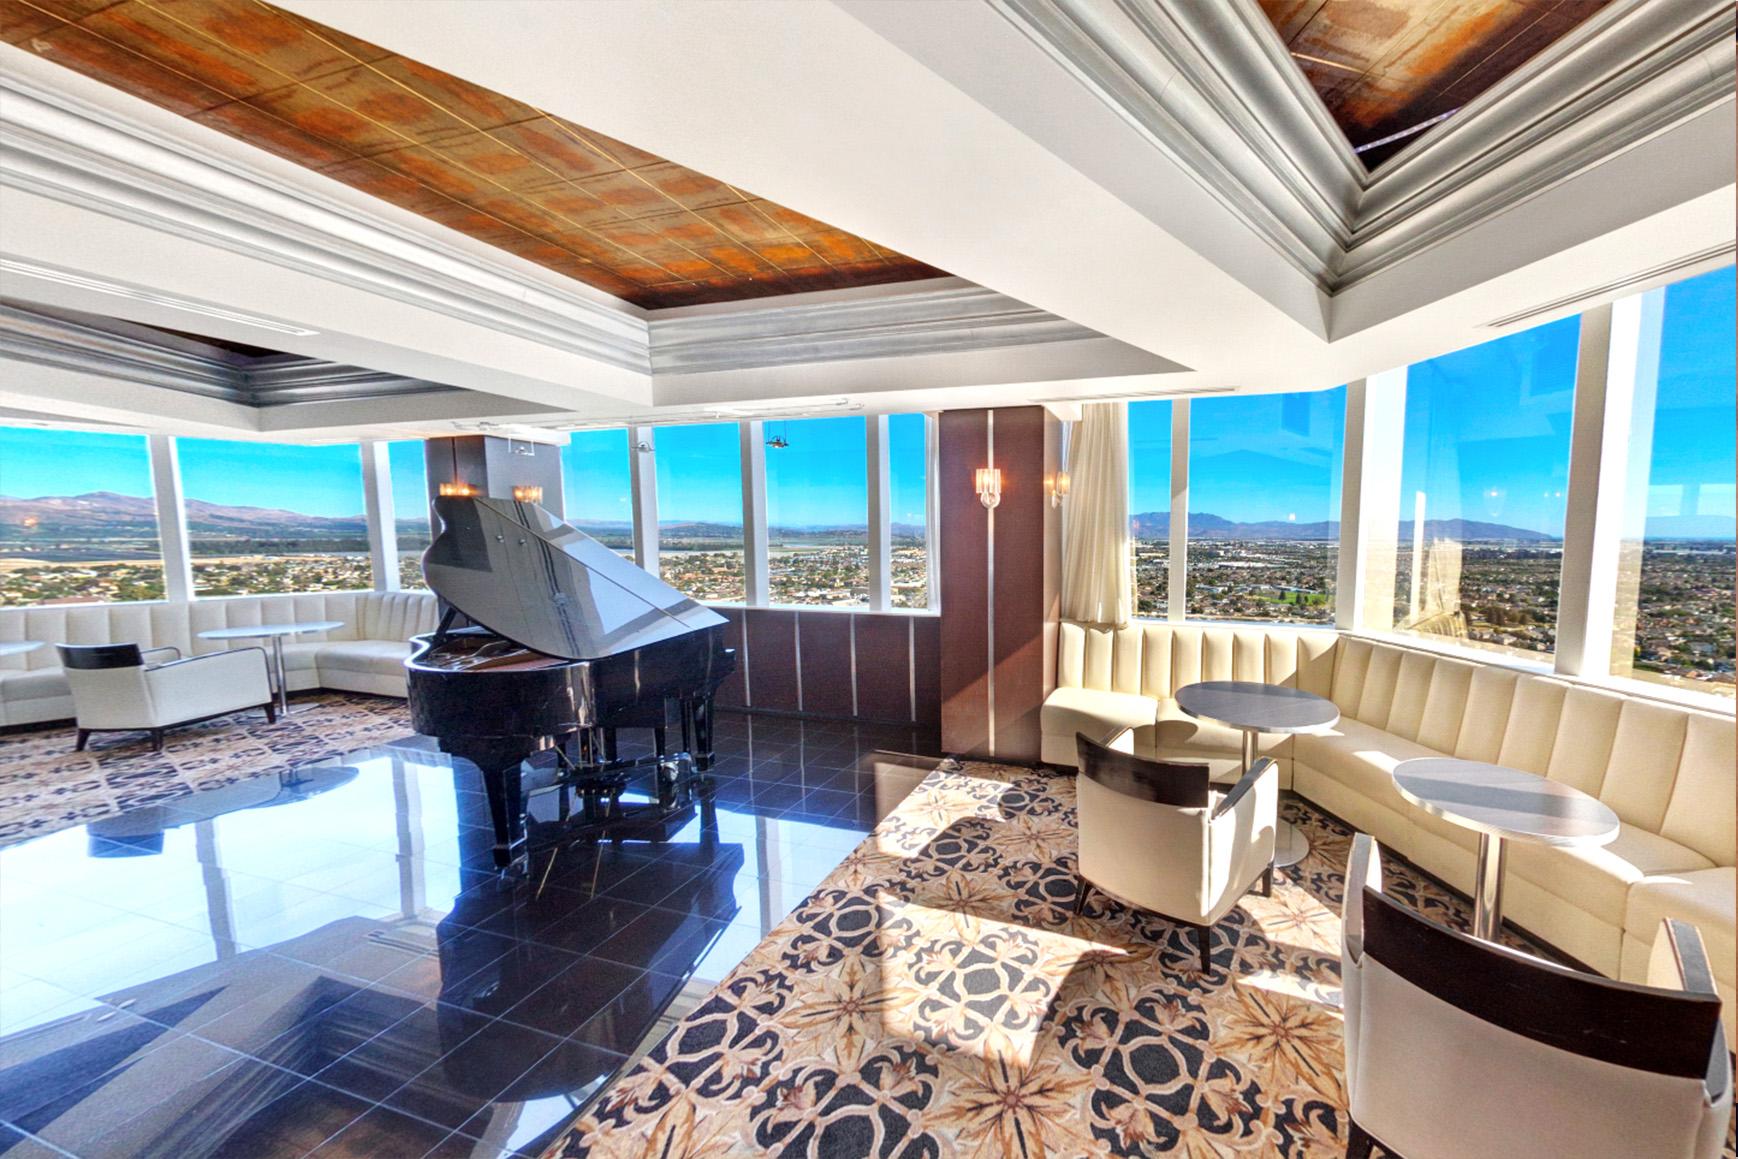 Pacific View Tower Club - Oxnard, California - Ventura County - Beach Wedding - Wedgewood Weddings